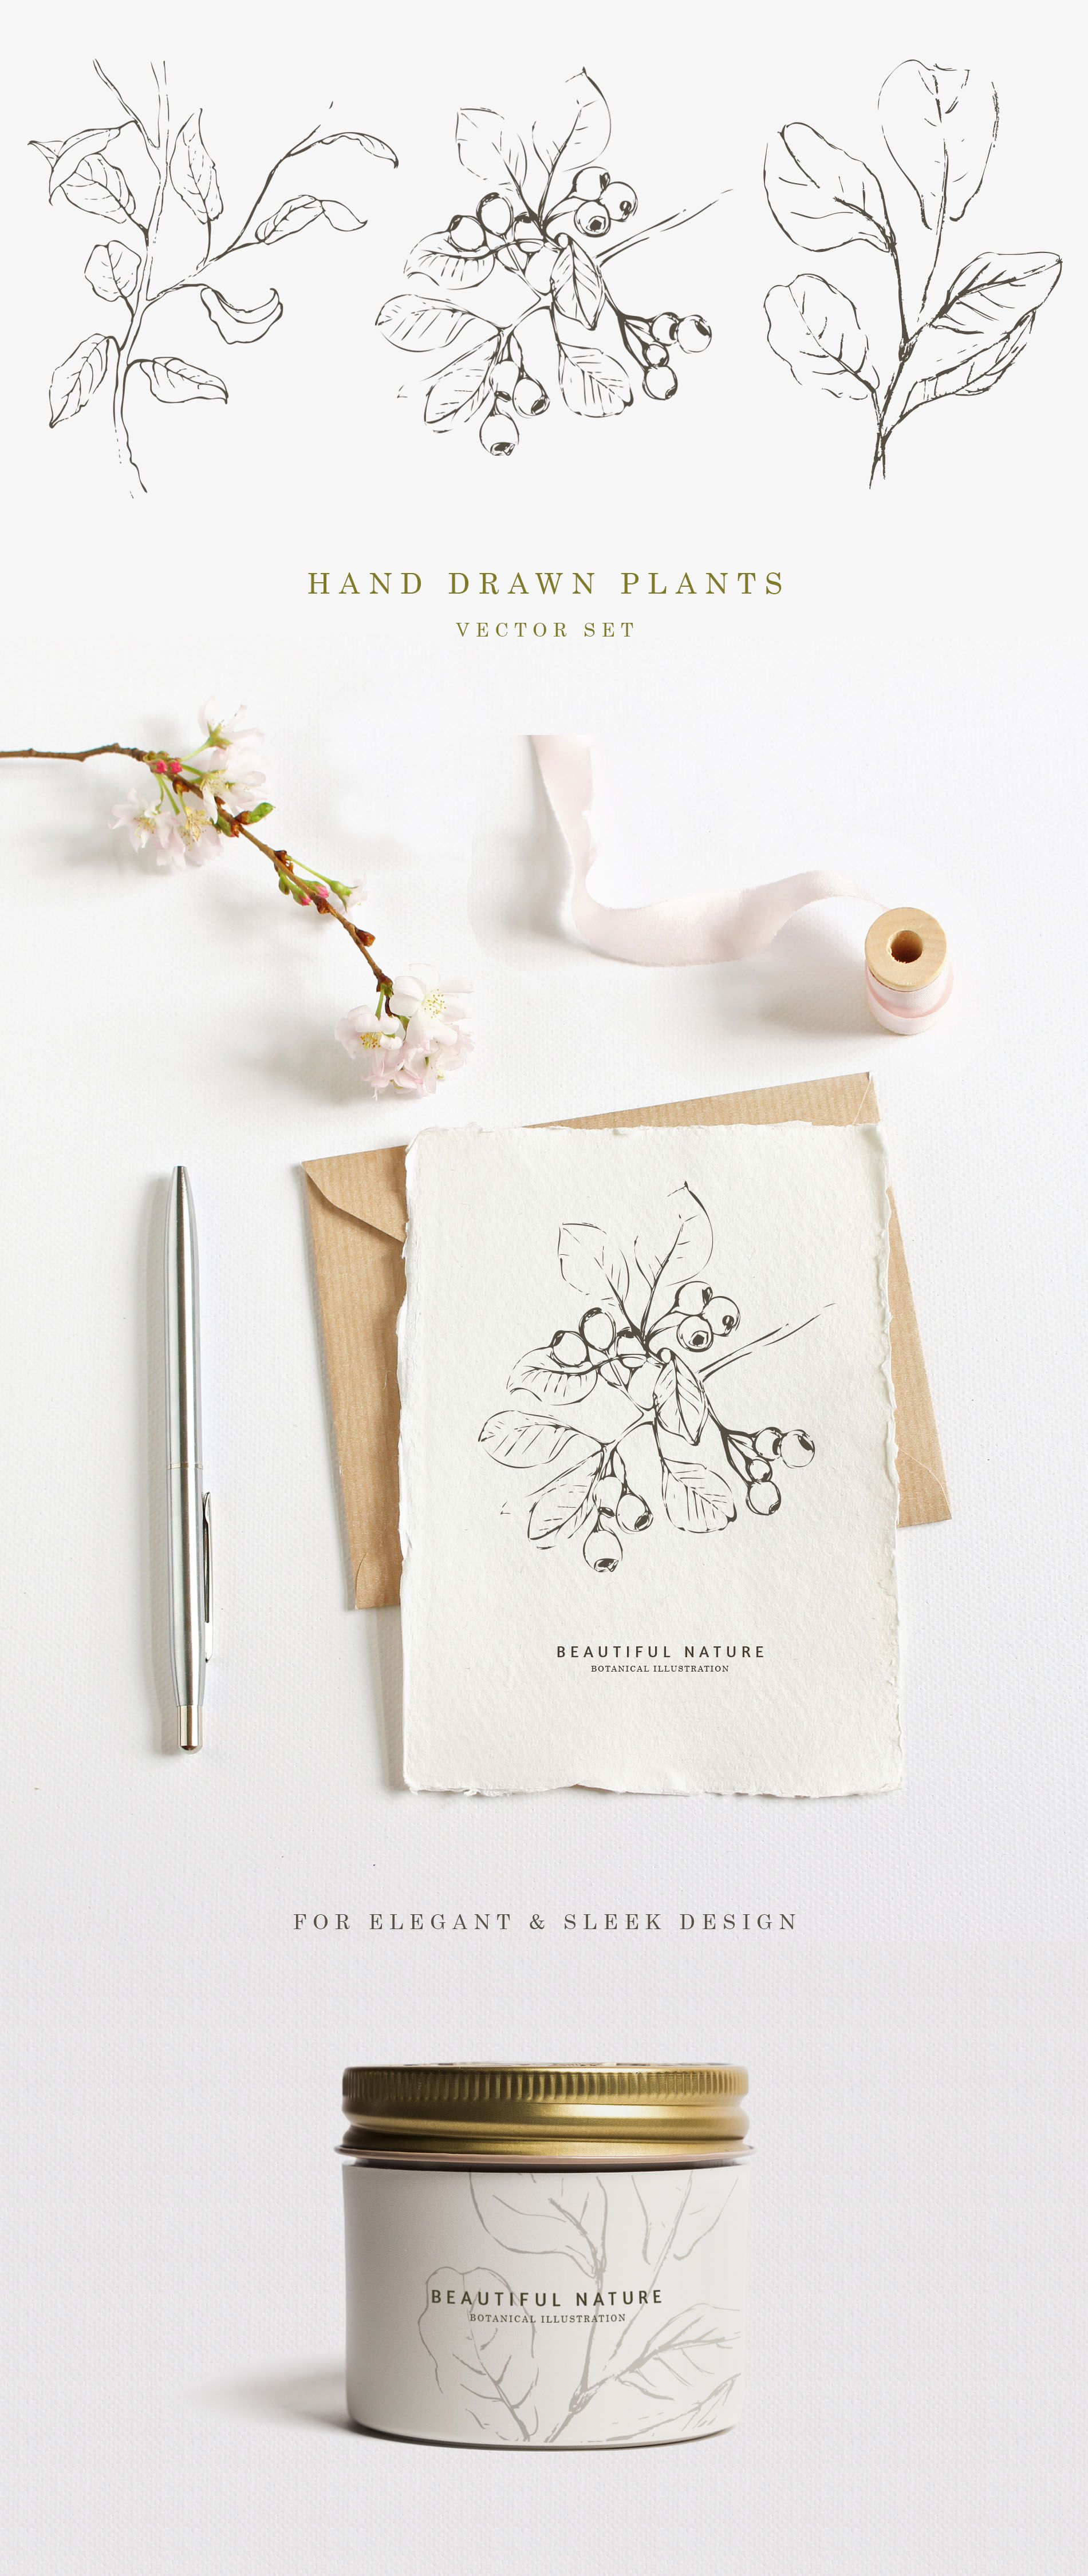 Hand drawn botanical plants for elegant and sleek design